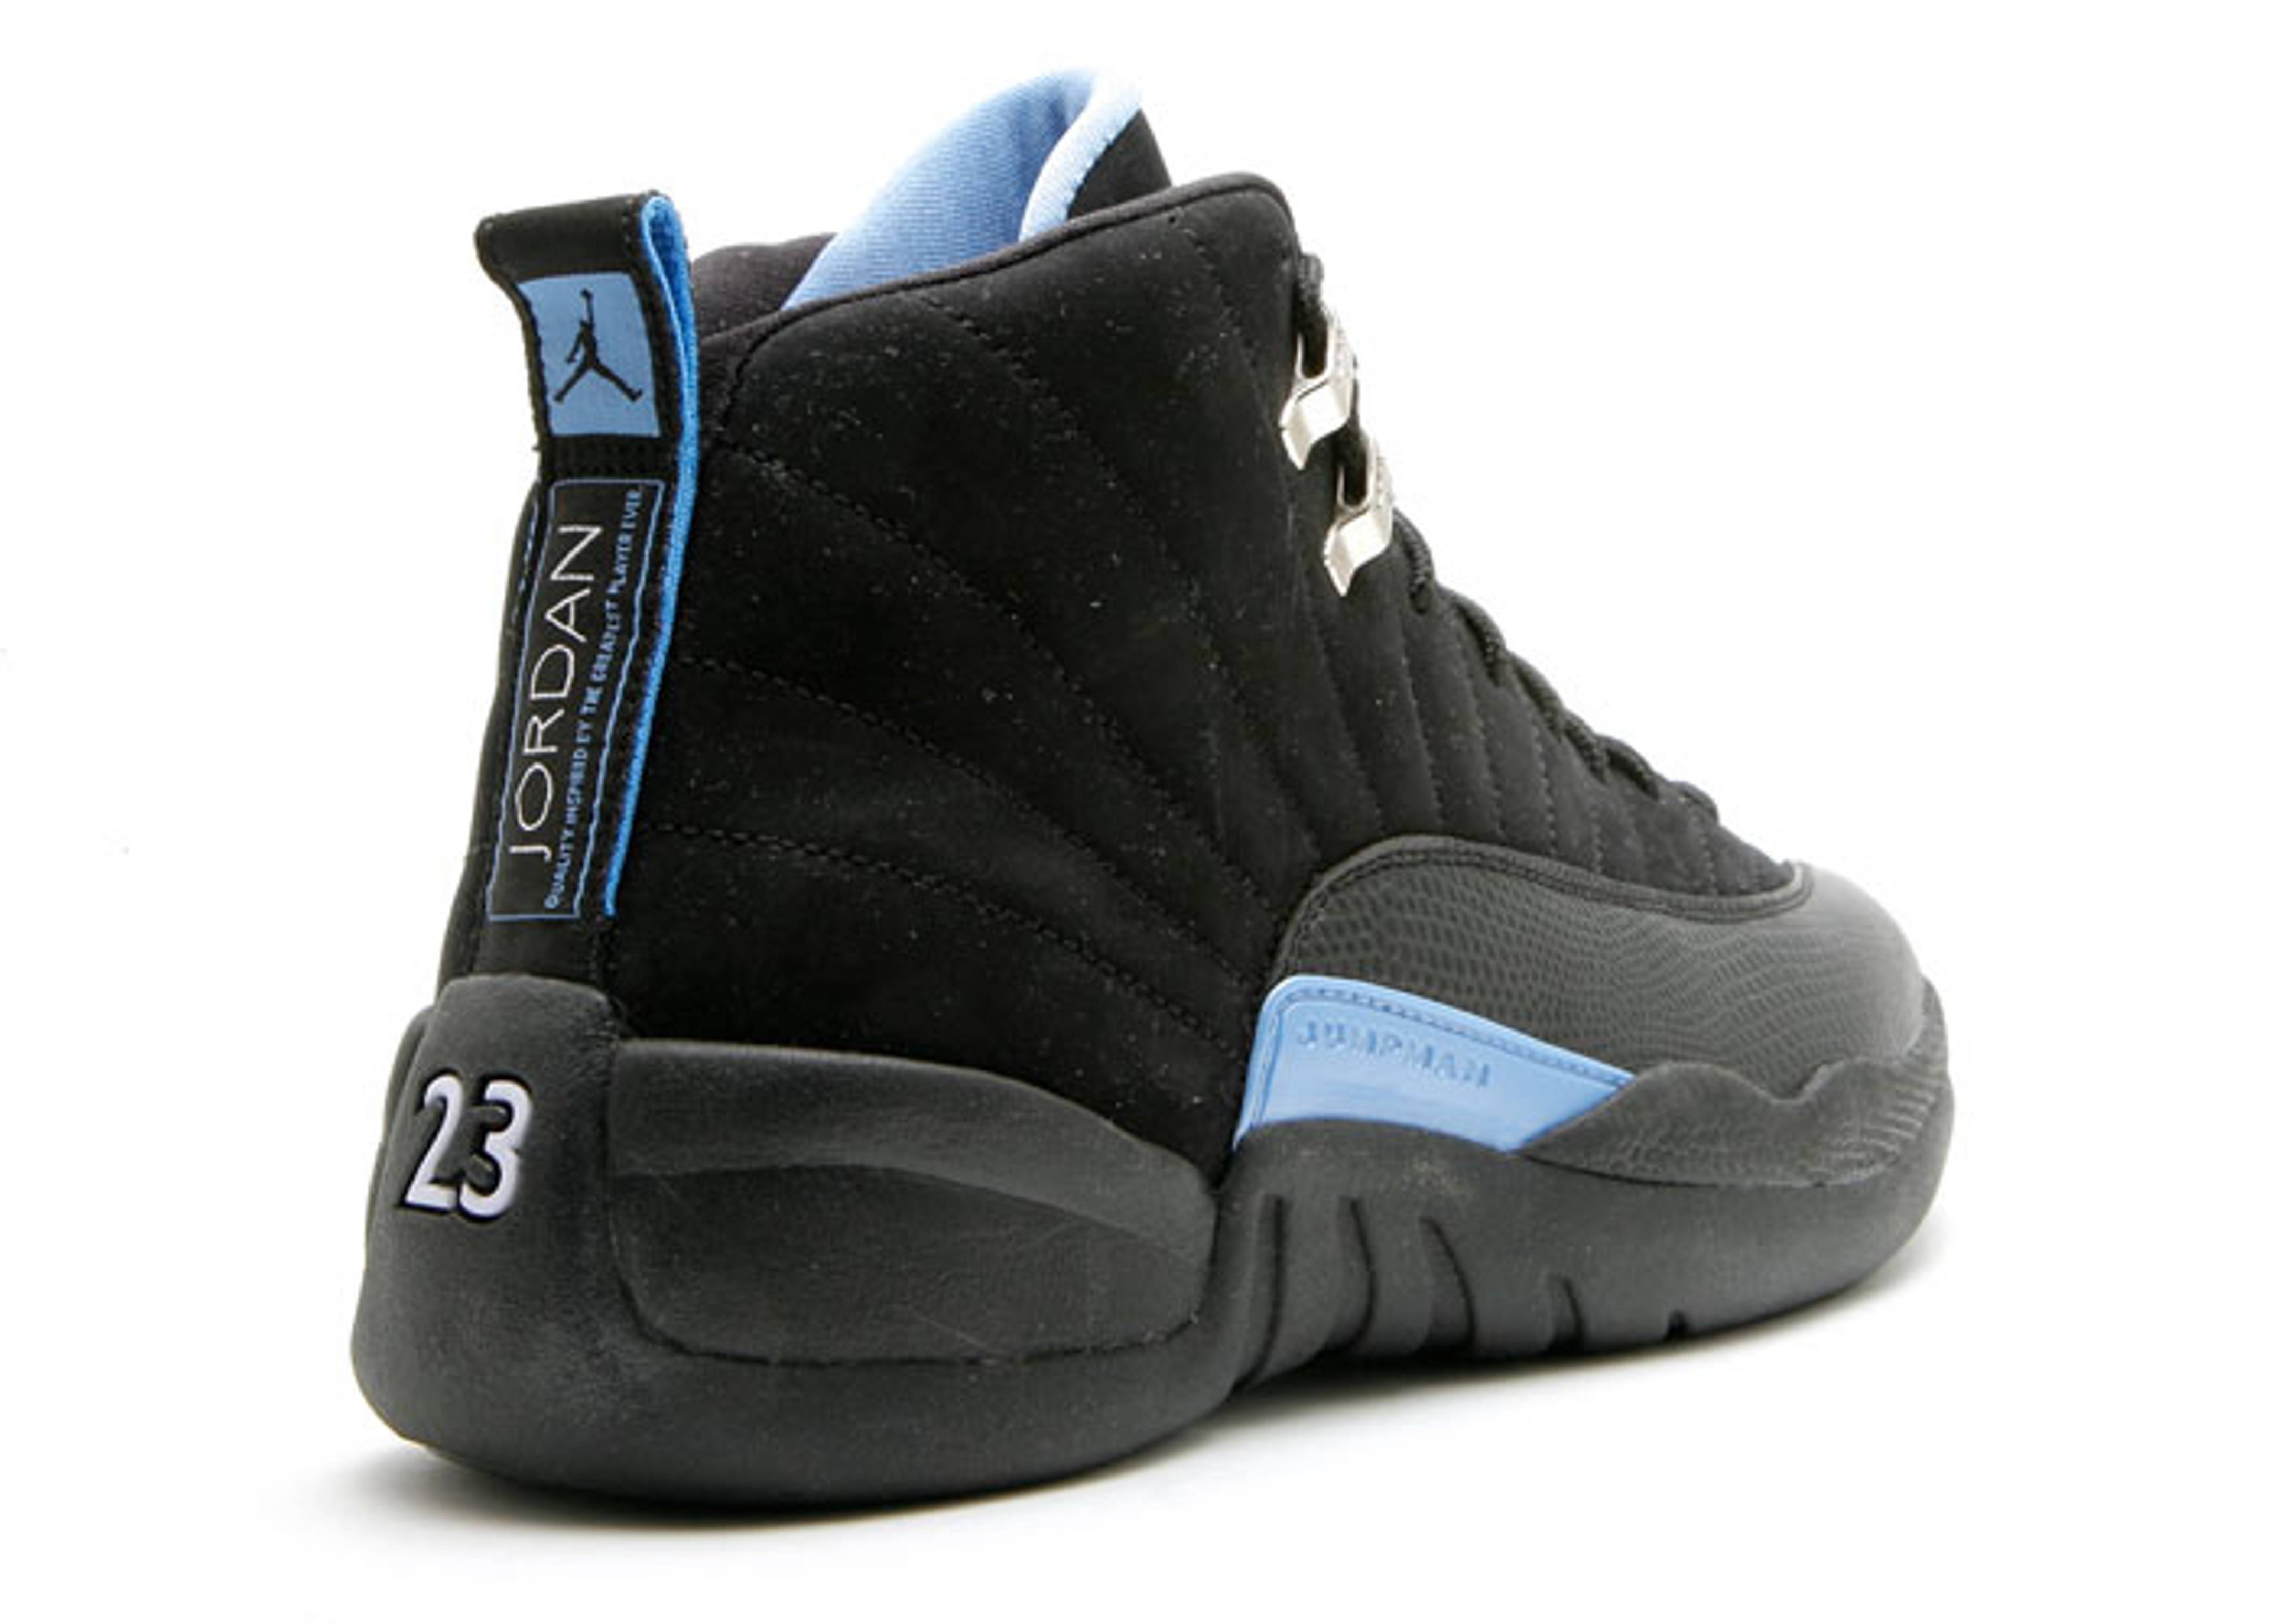 sale air jordan 12 university blue black 9da18 44e05 efcf16d72